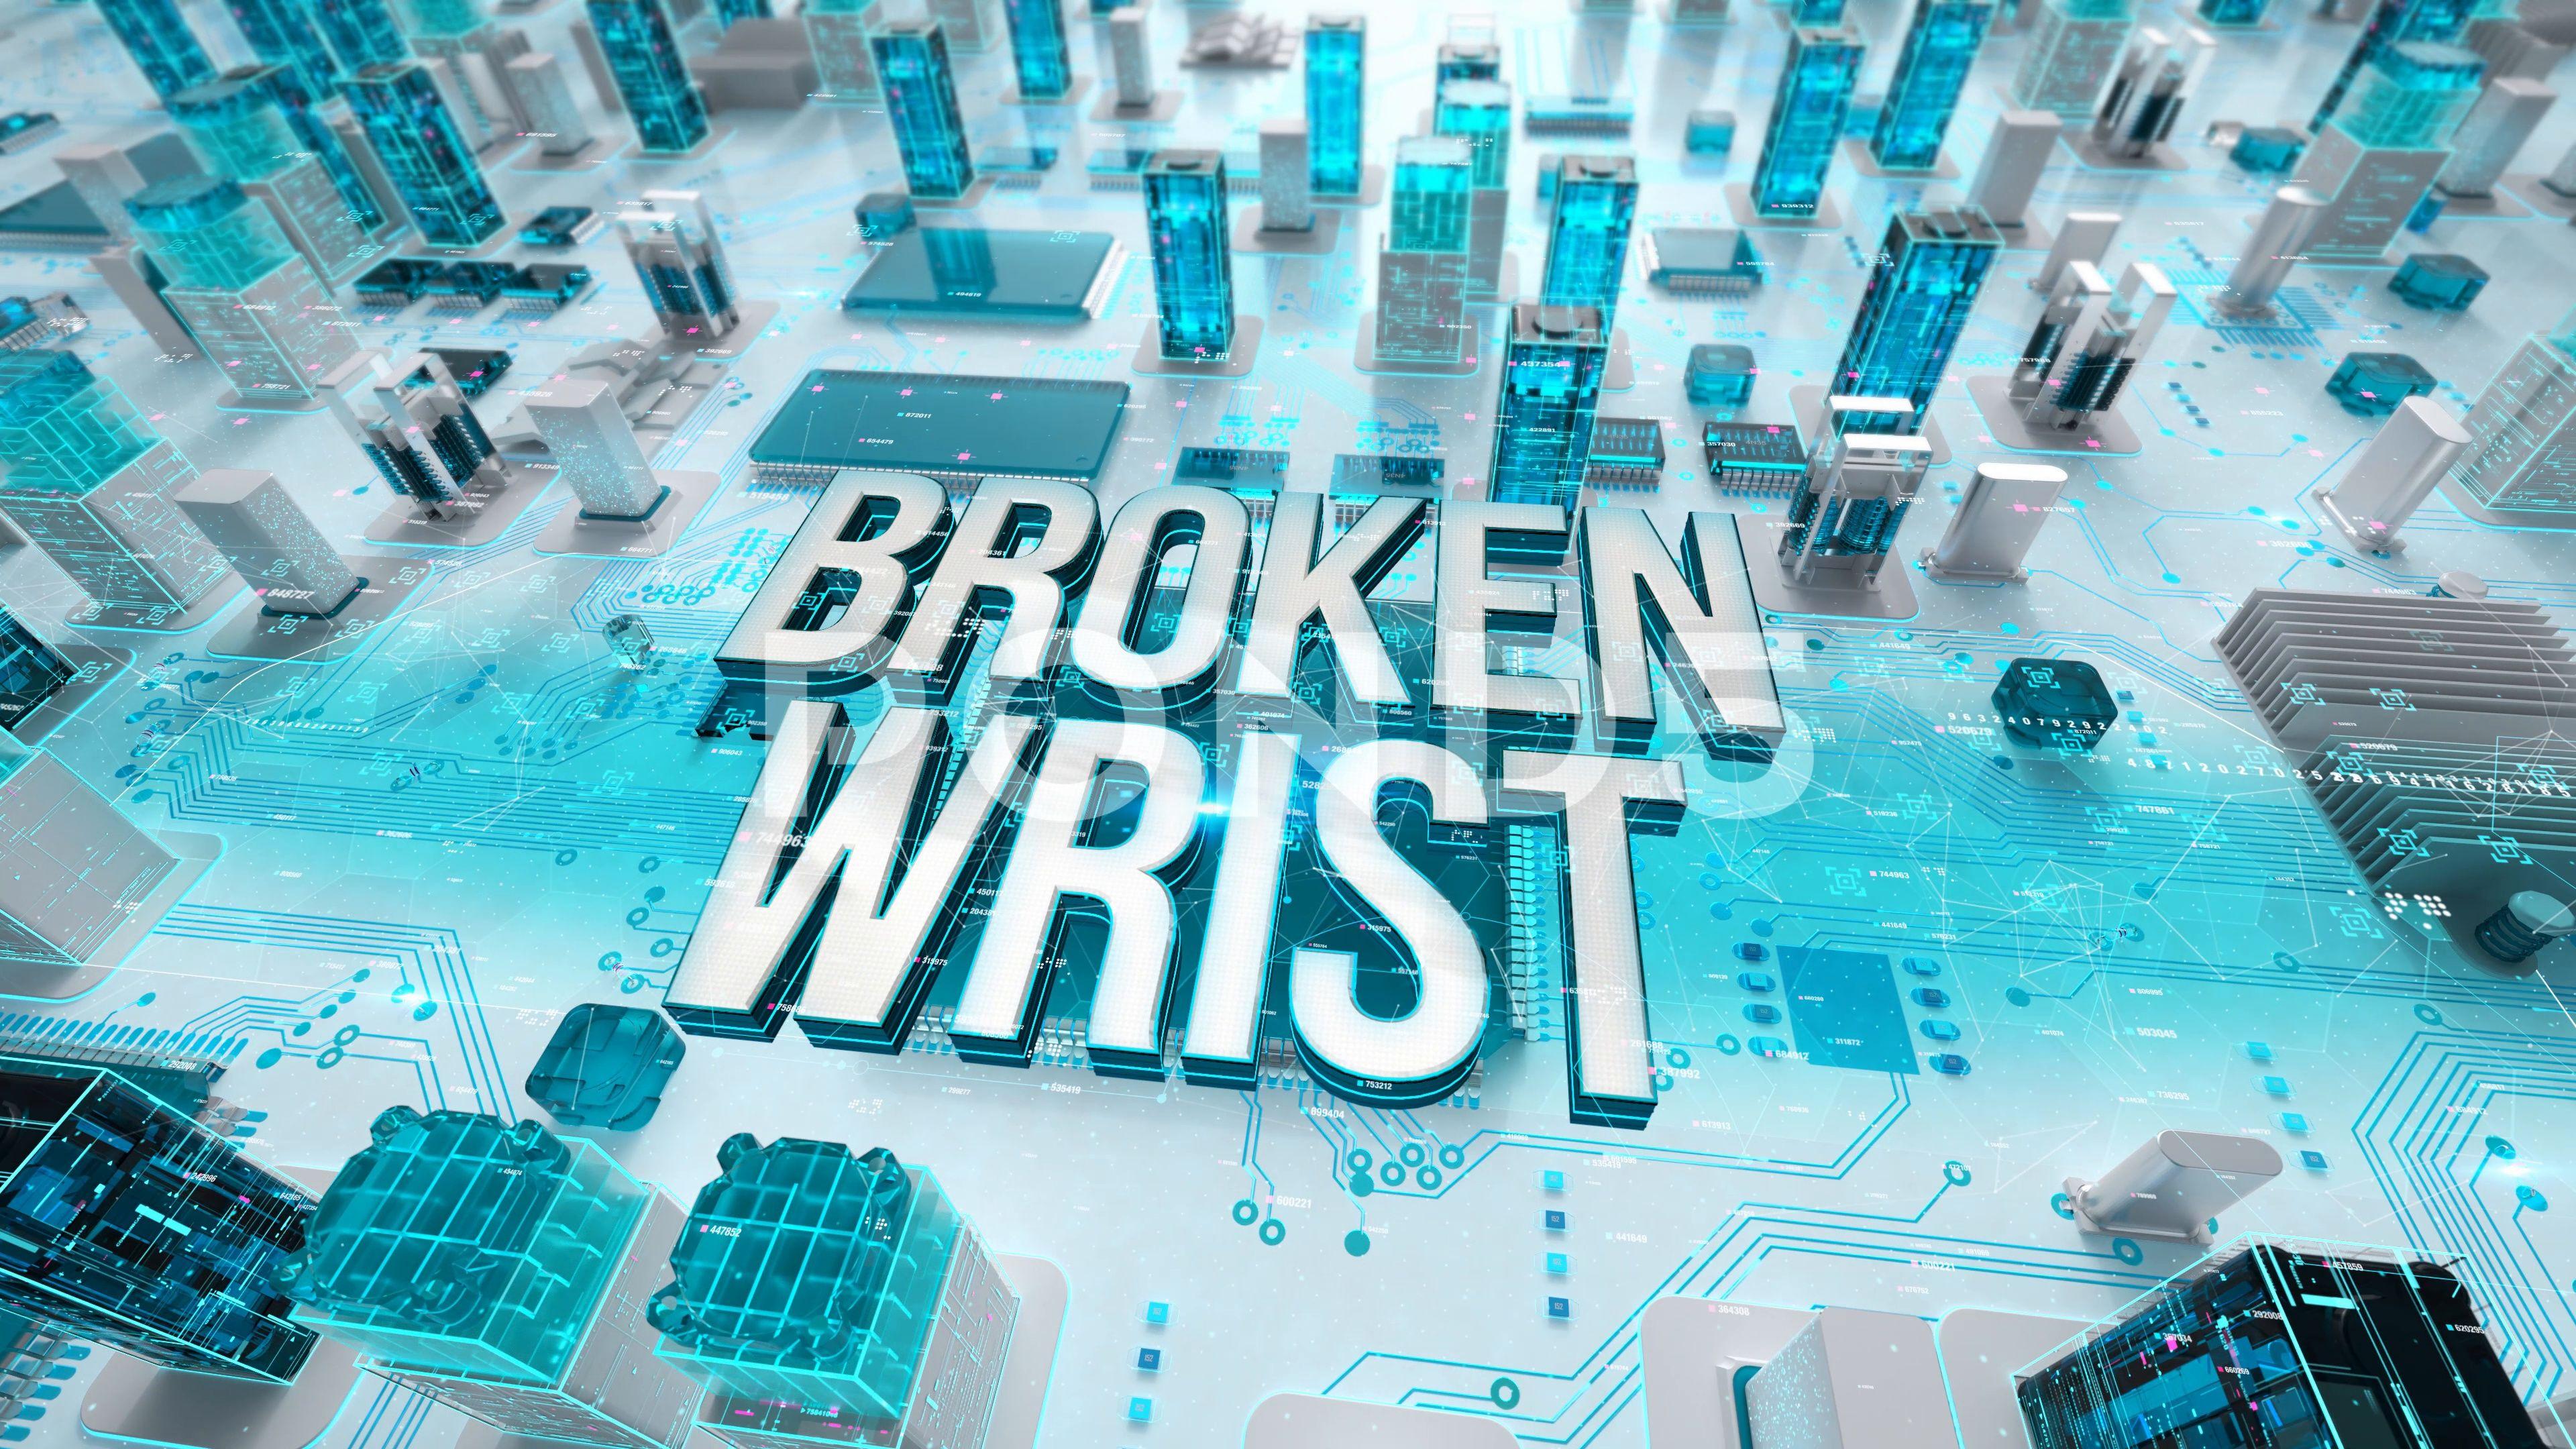 Broken Wrist with medical digital technology concept Stock